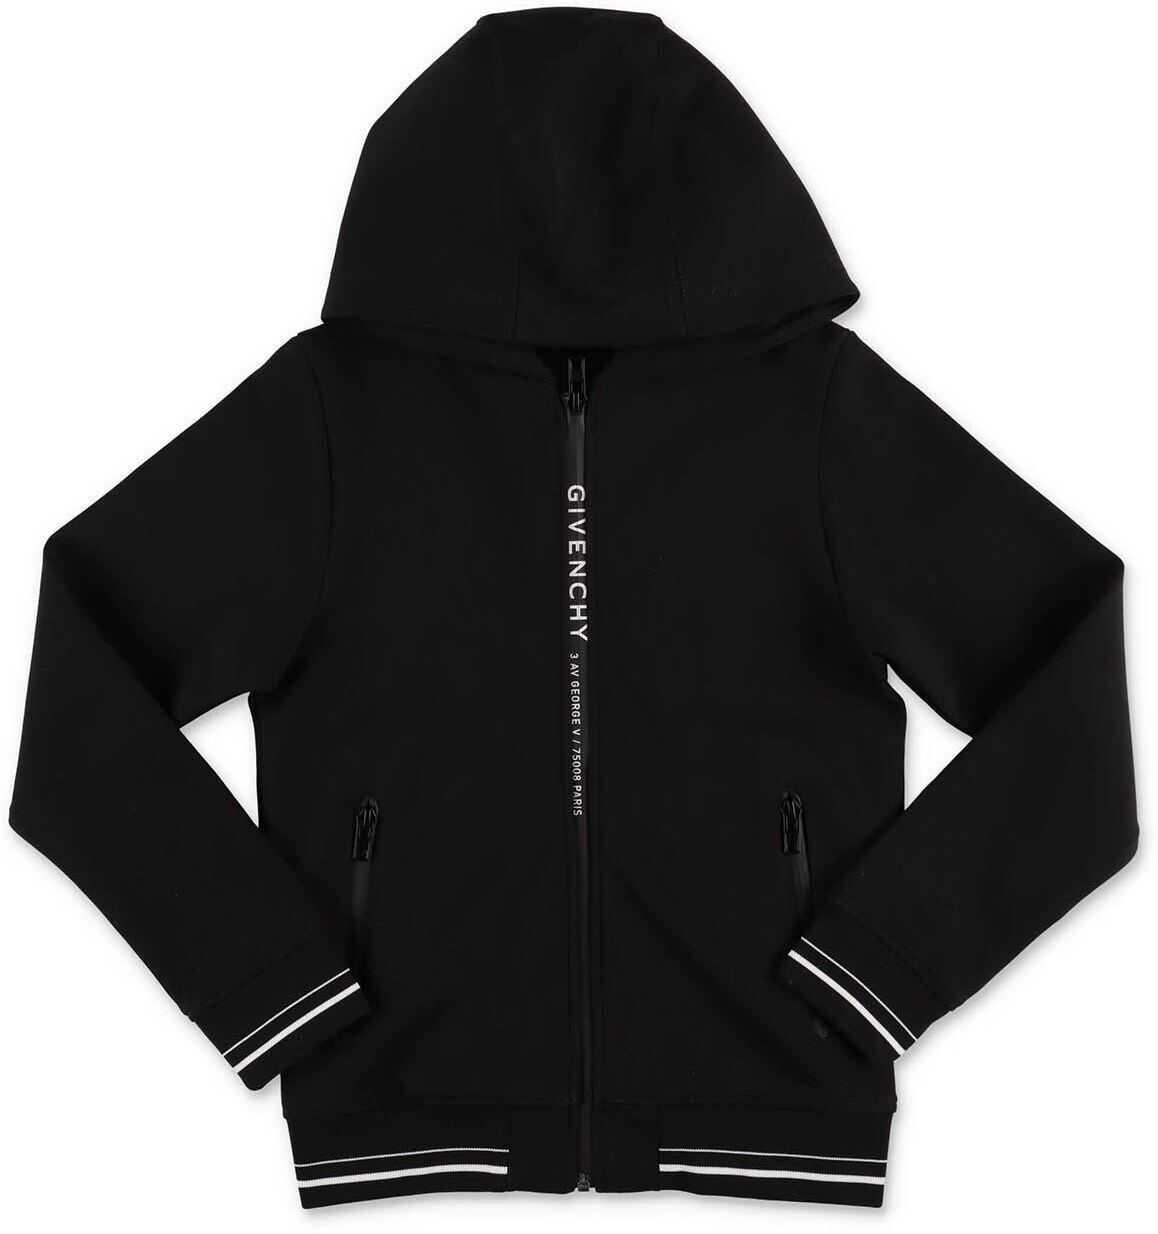 Zipped Sweatshirt In Black